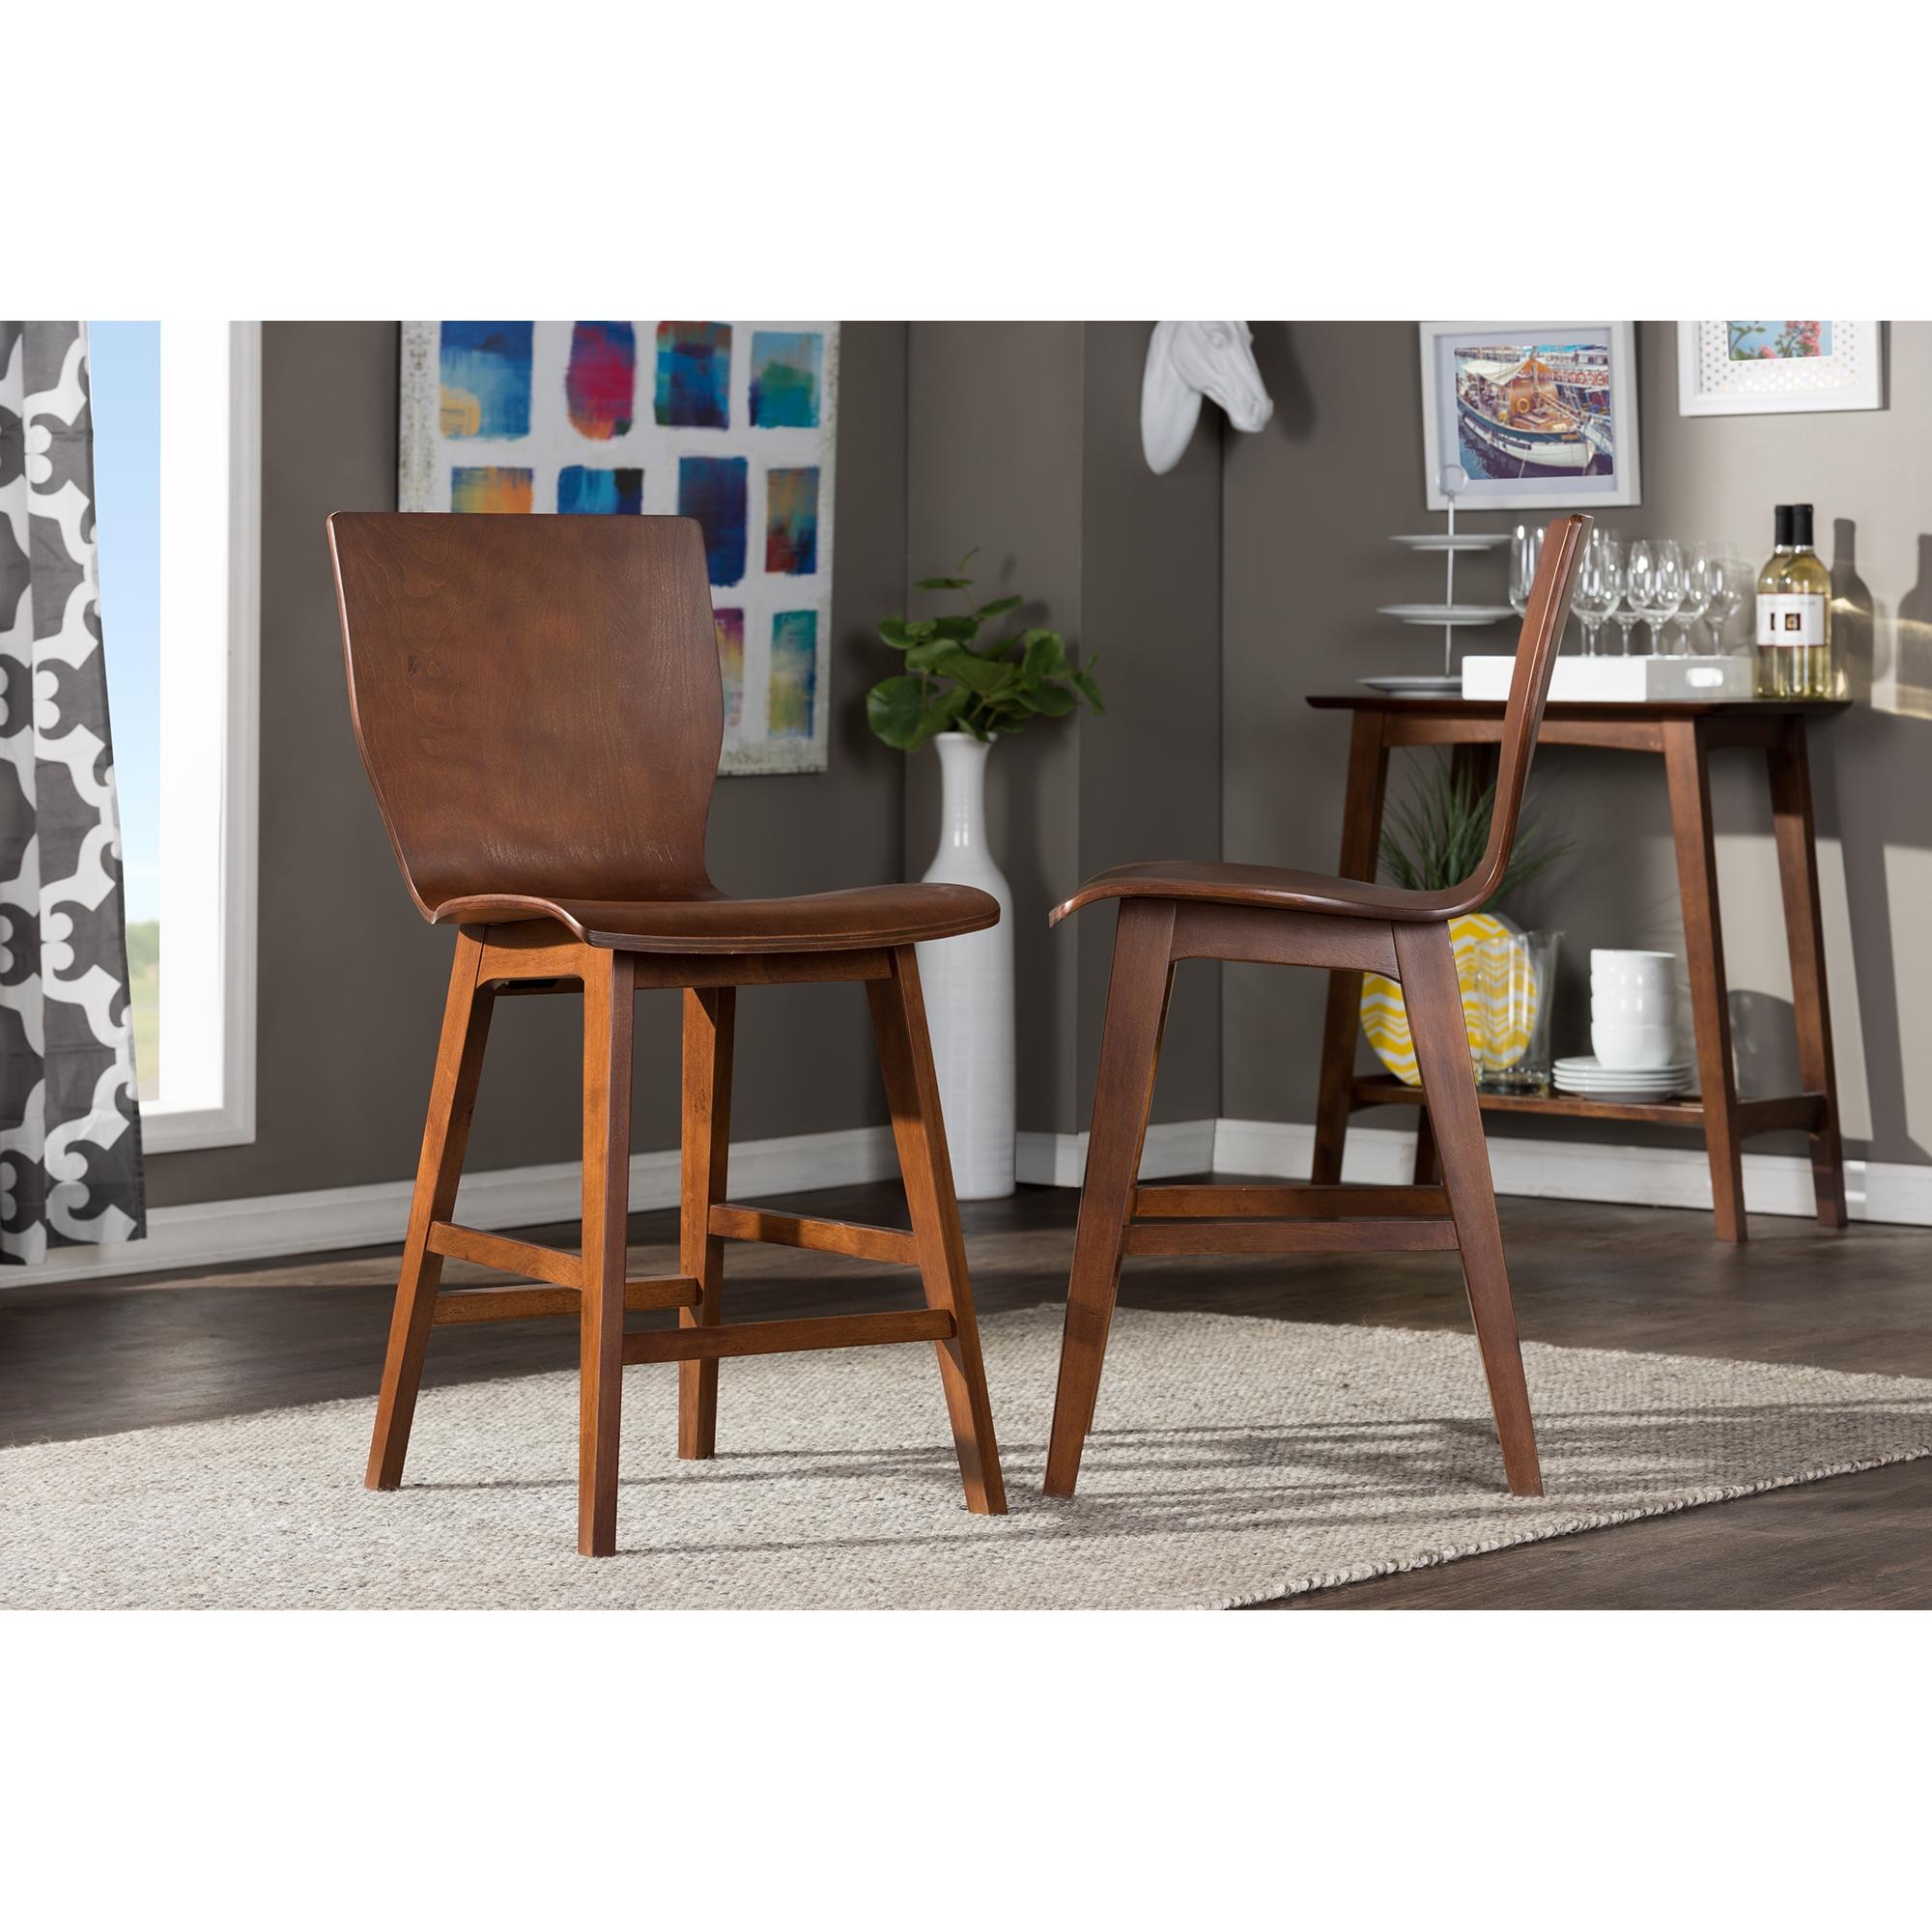 baxton studio elsa midcentury modern style dark walnut bent wood counter stool